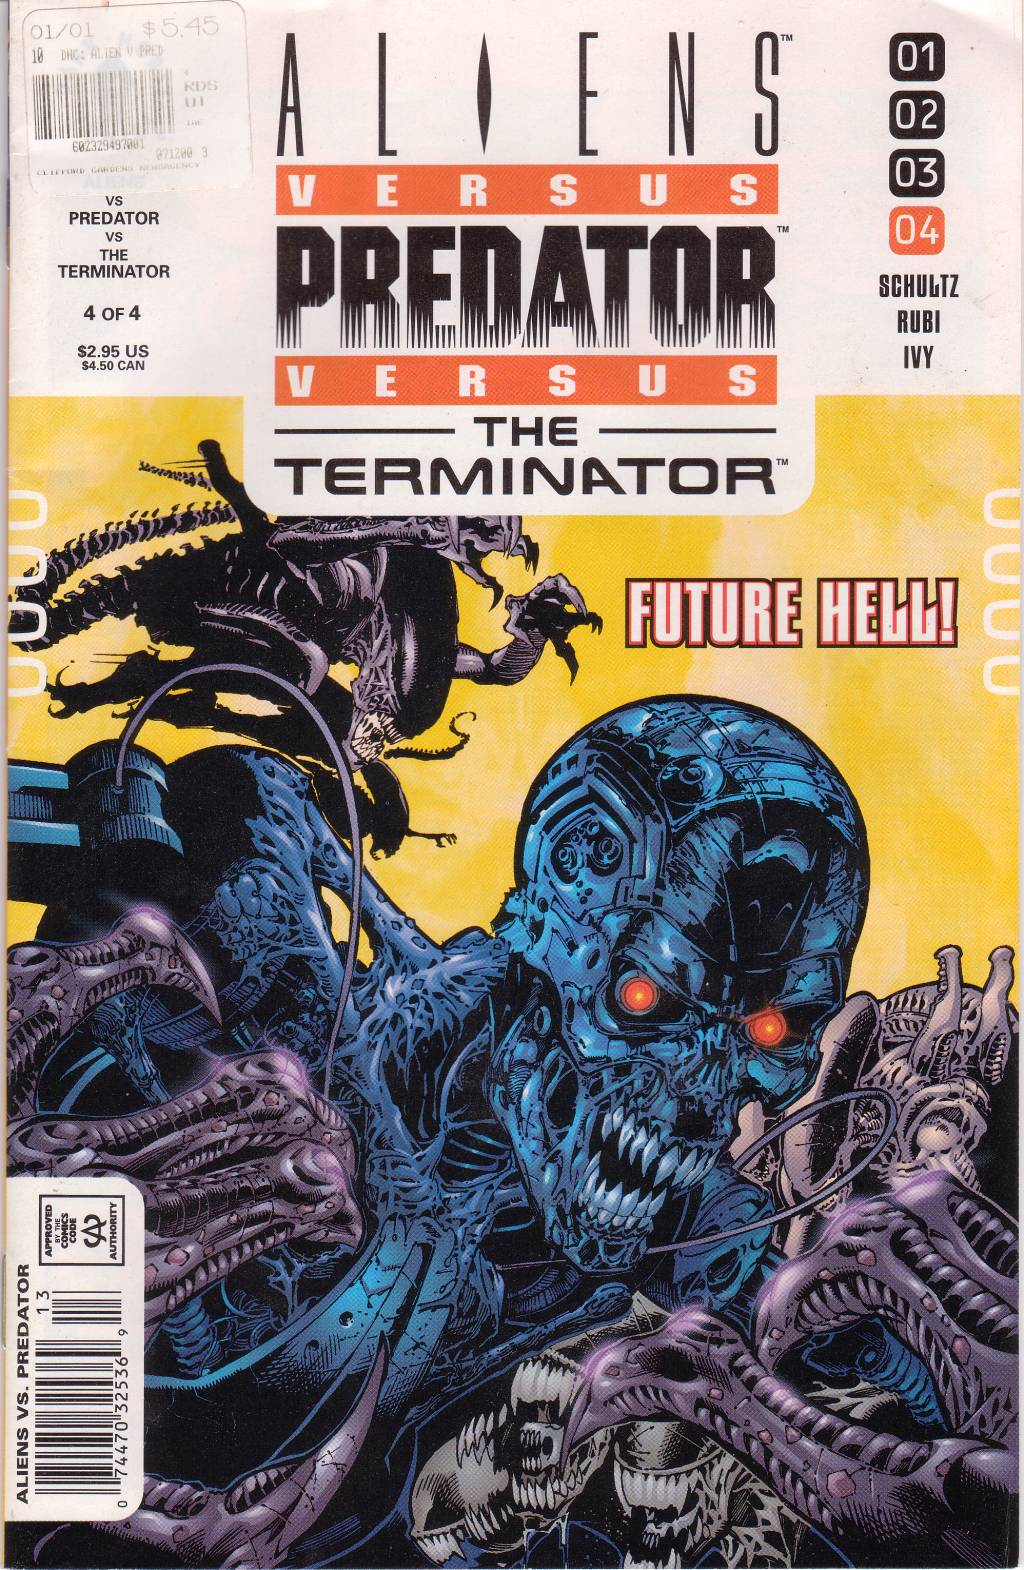 Aliens vs. Predator vs. The Terminator 4 Page 1